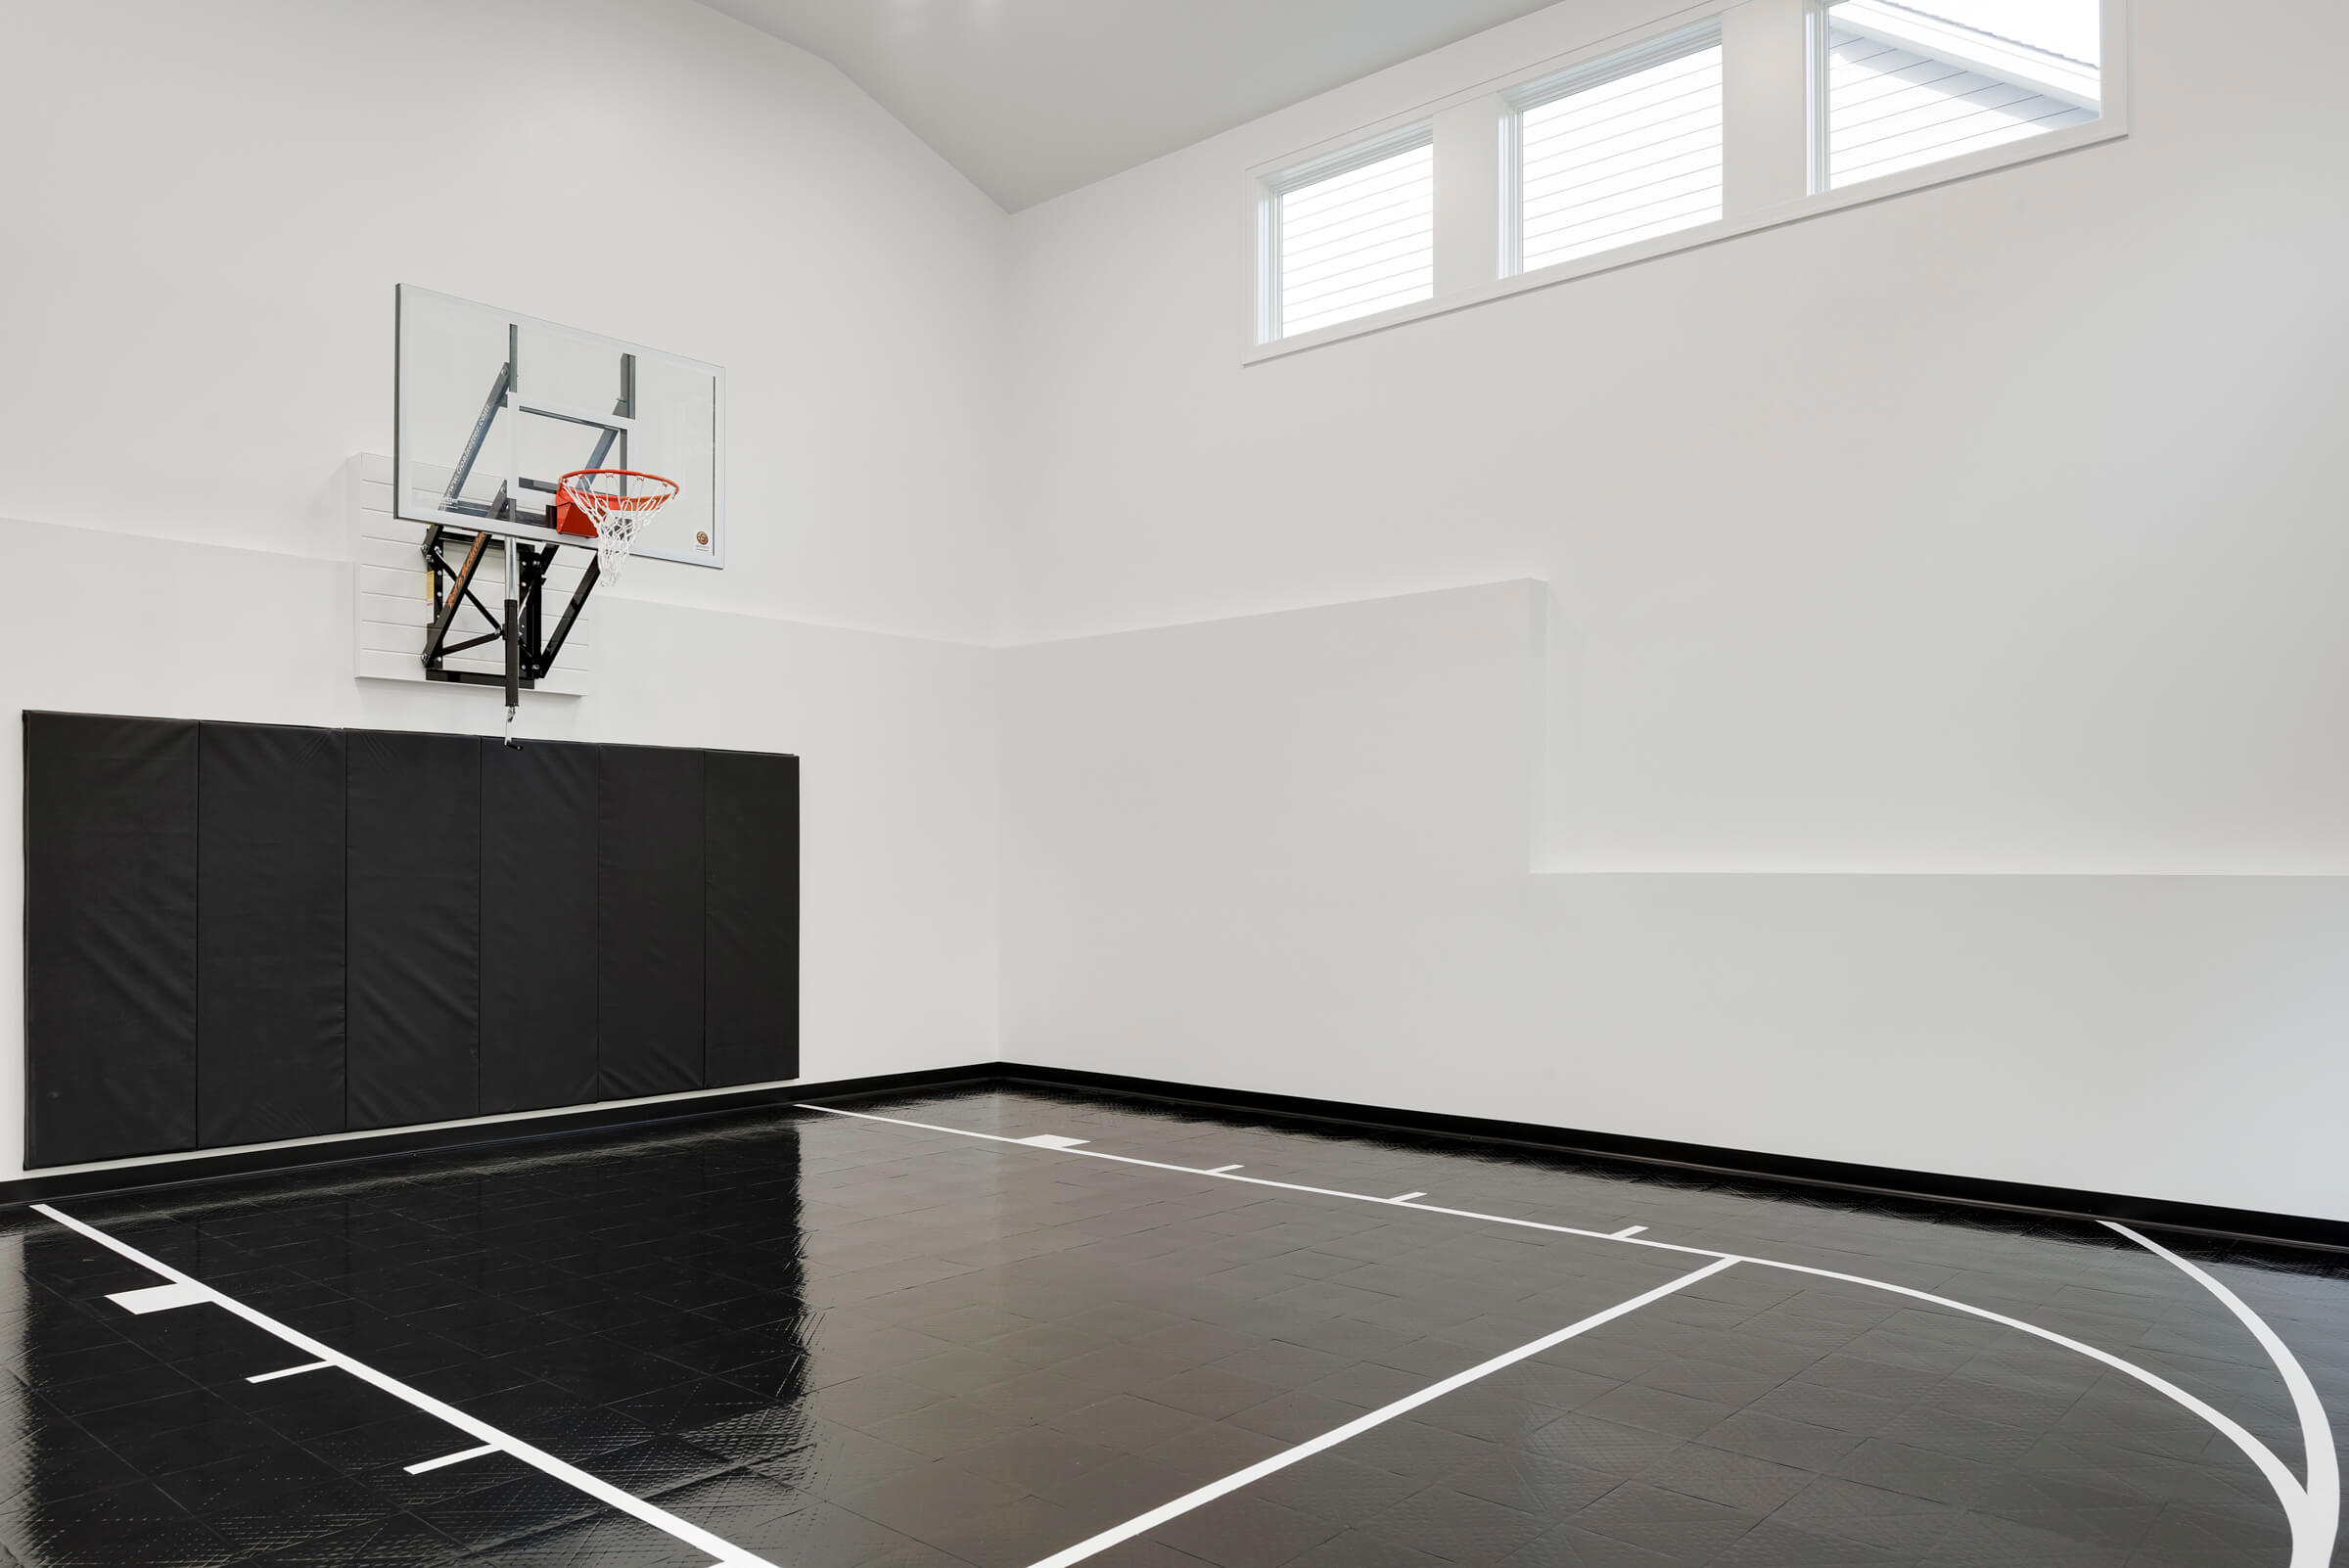 Hawks Sport Court